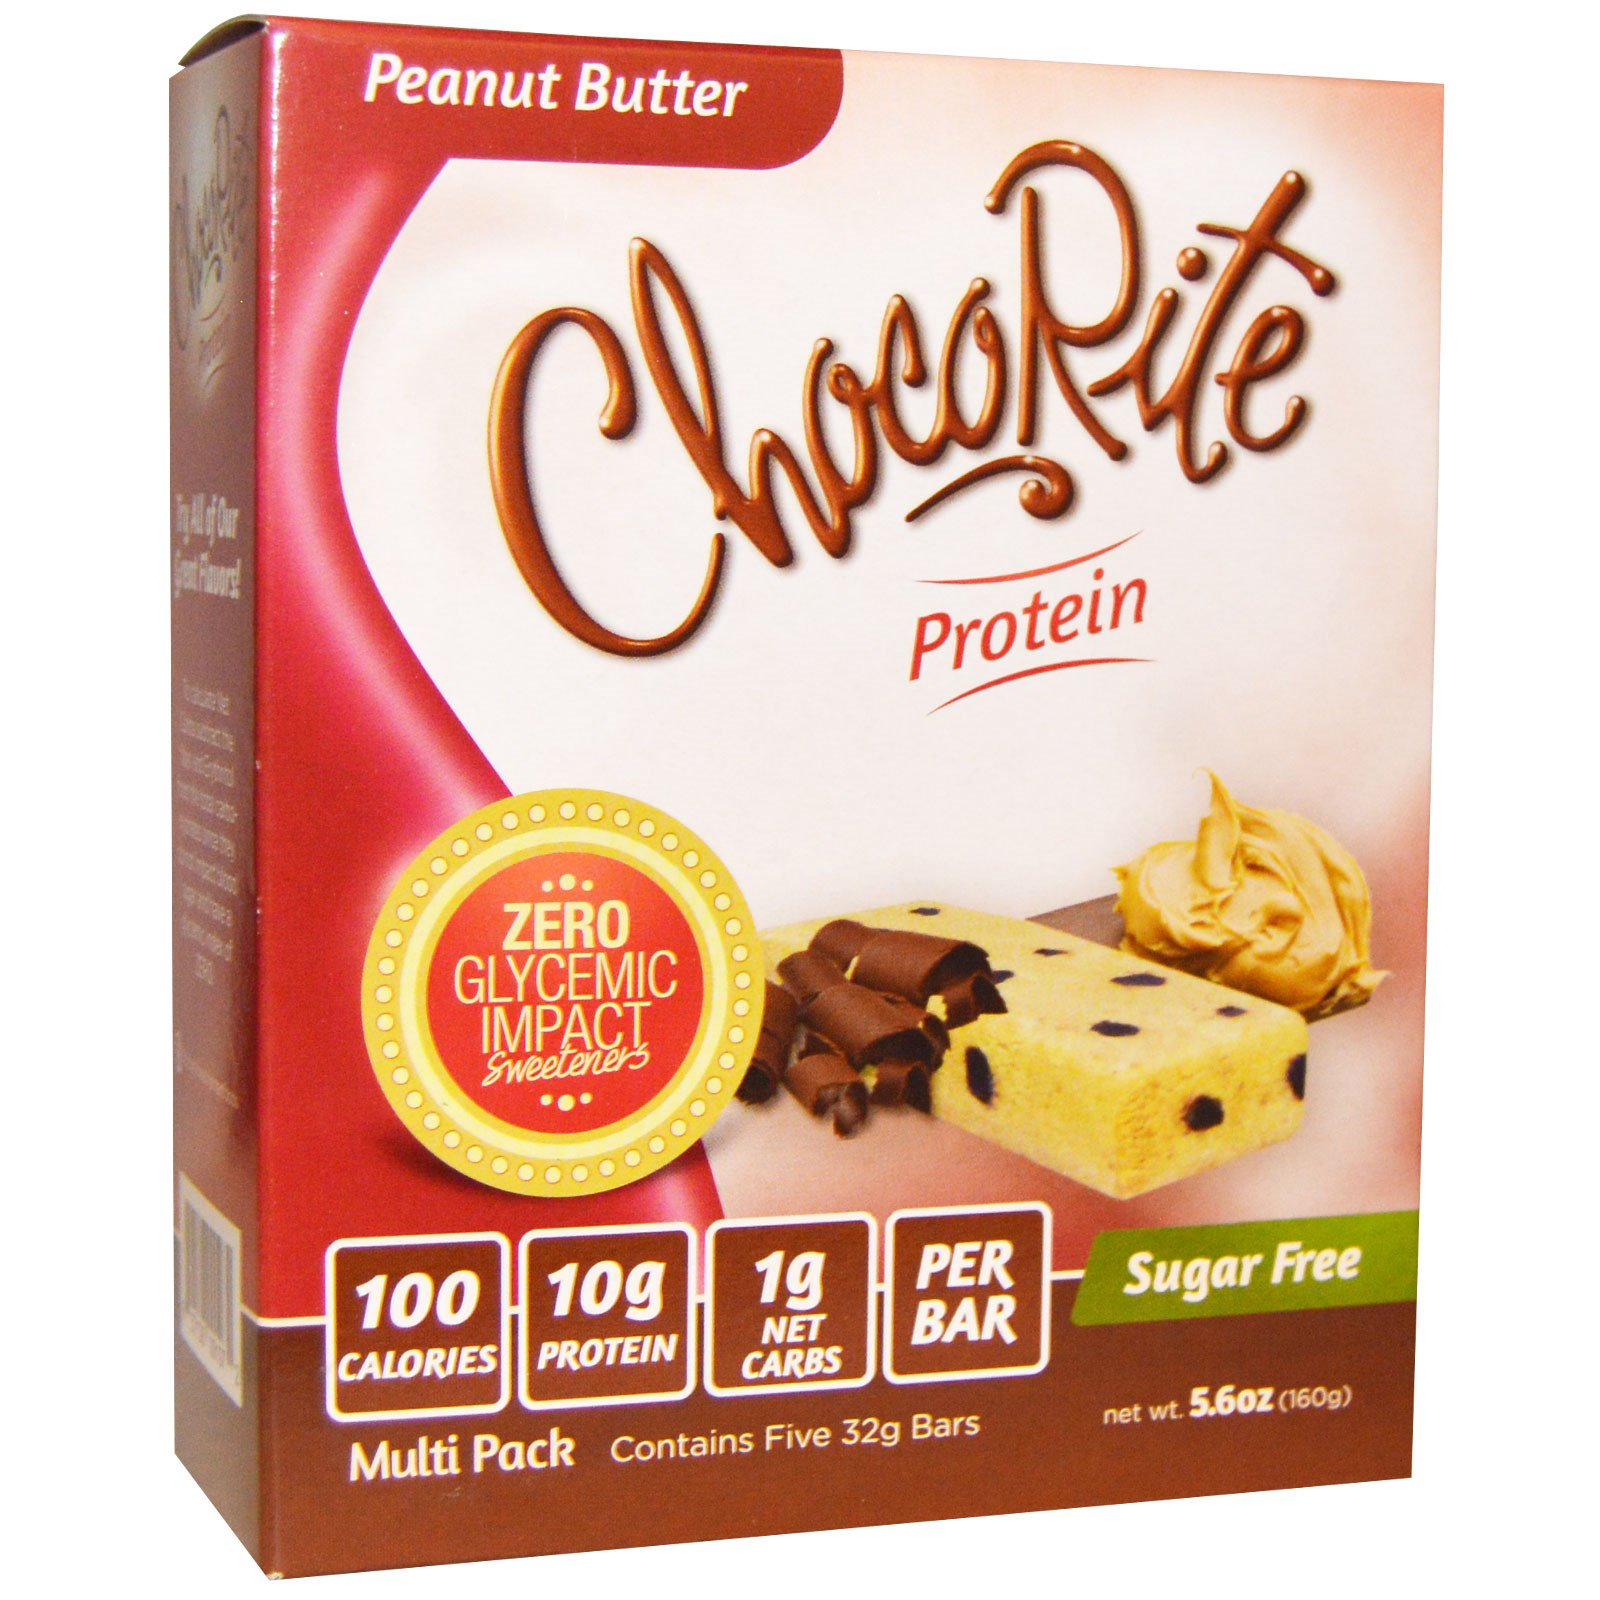 HealthSmart Foods, Inc., ChocoRite Protein, Peanut Butter, Sugar Free, 5 Bars, 5.6 oz (160 g)